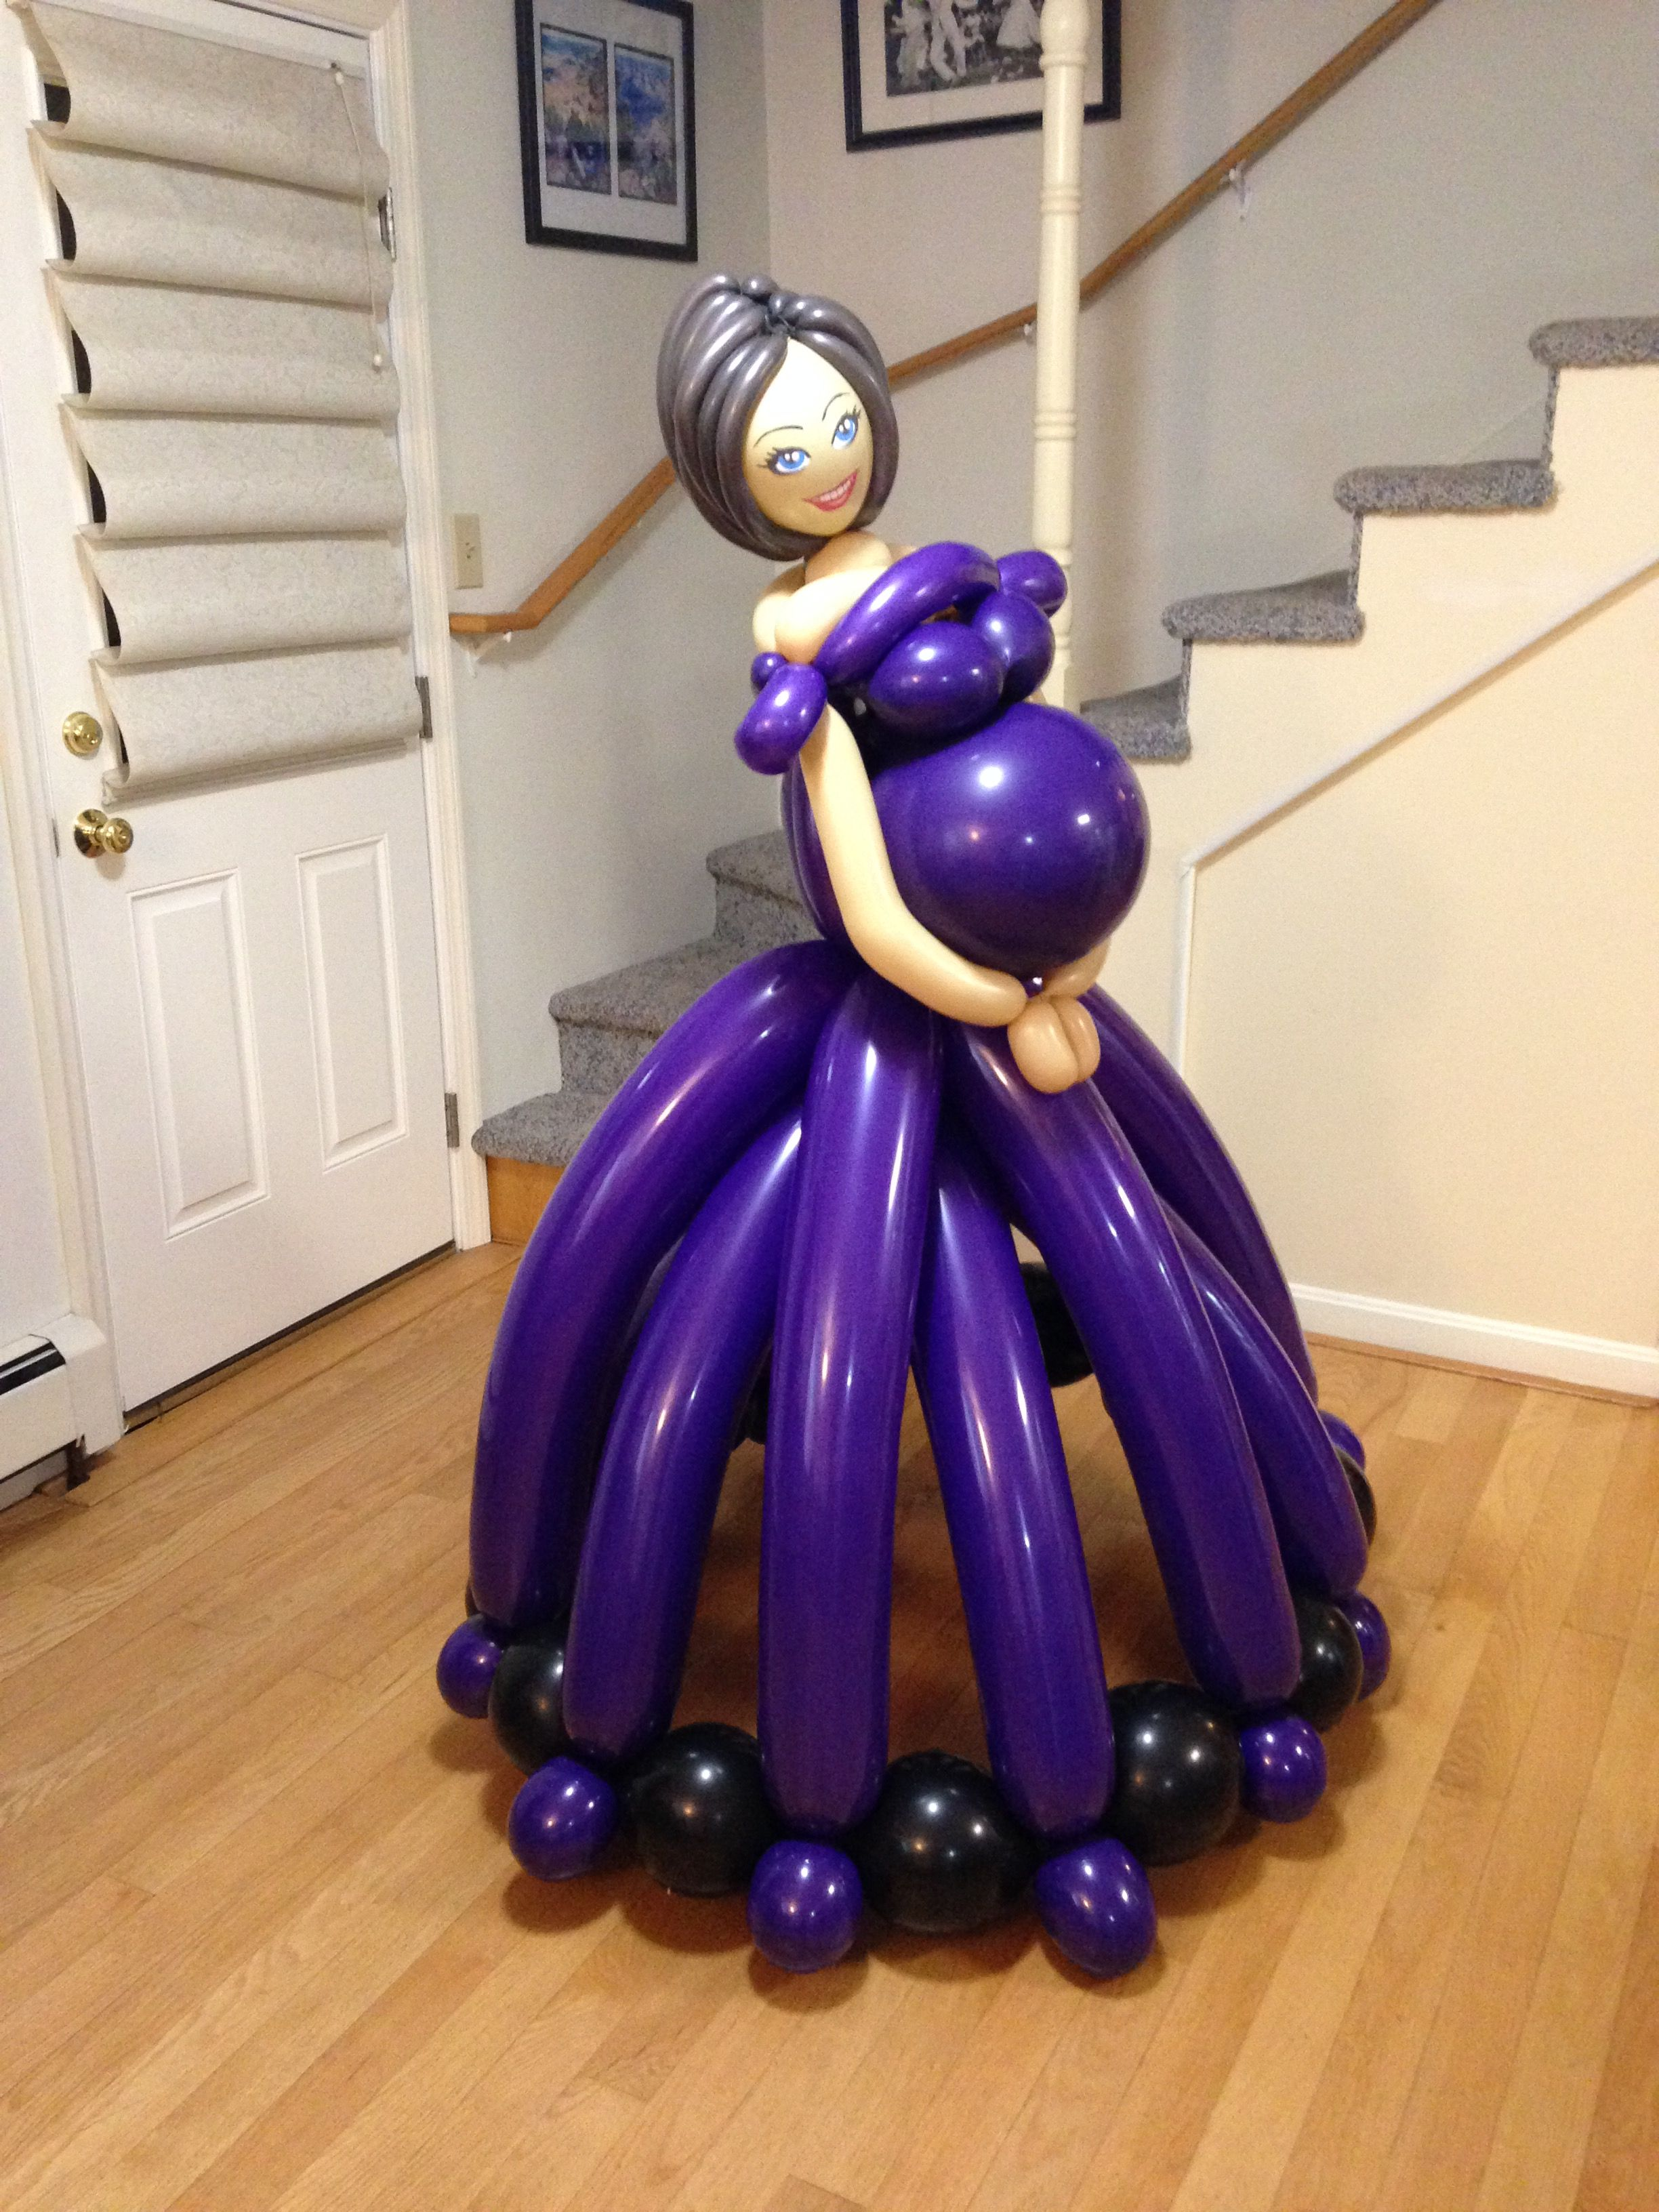 Abby London S Pregnant Lady Balloon Life Size Version